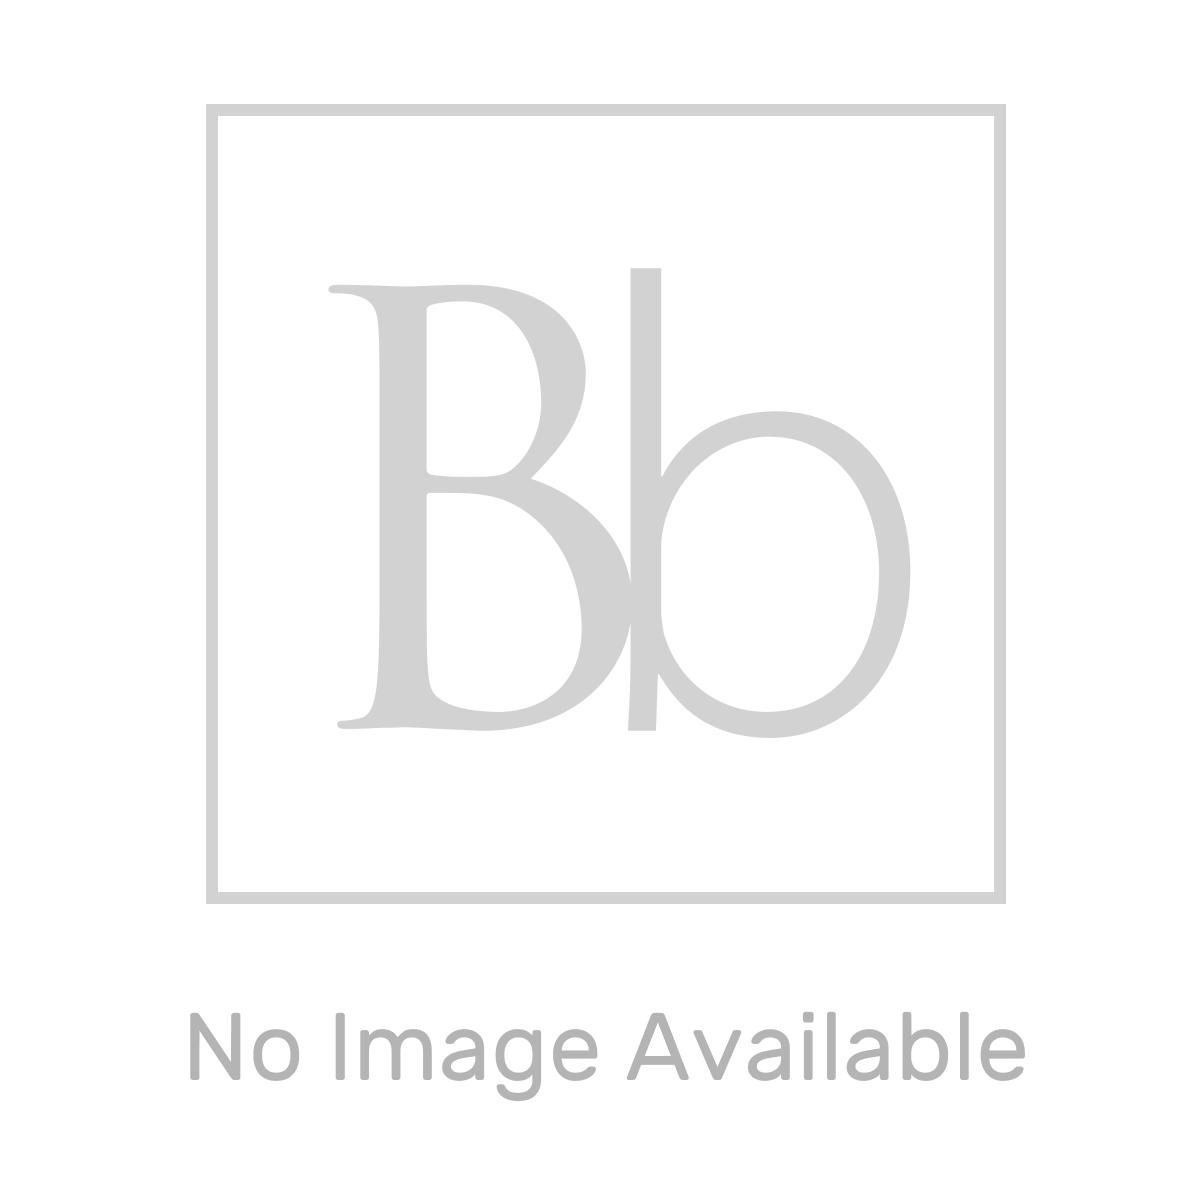 April Black Slate Shower Tray 1700 x 760 Line Drawing